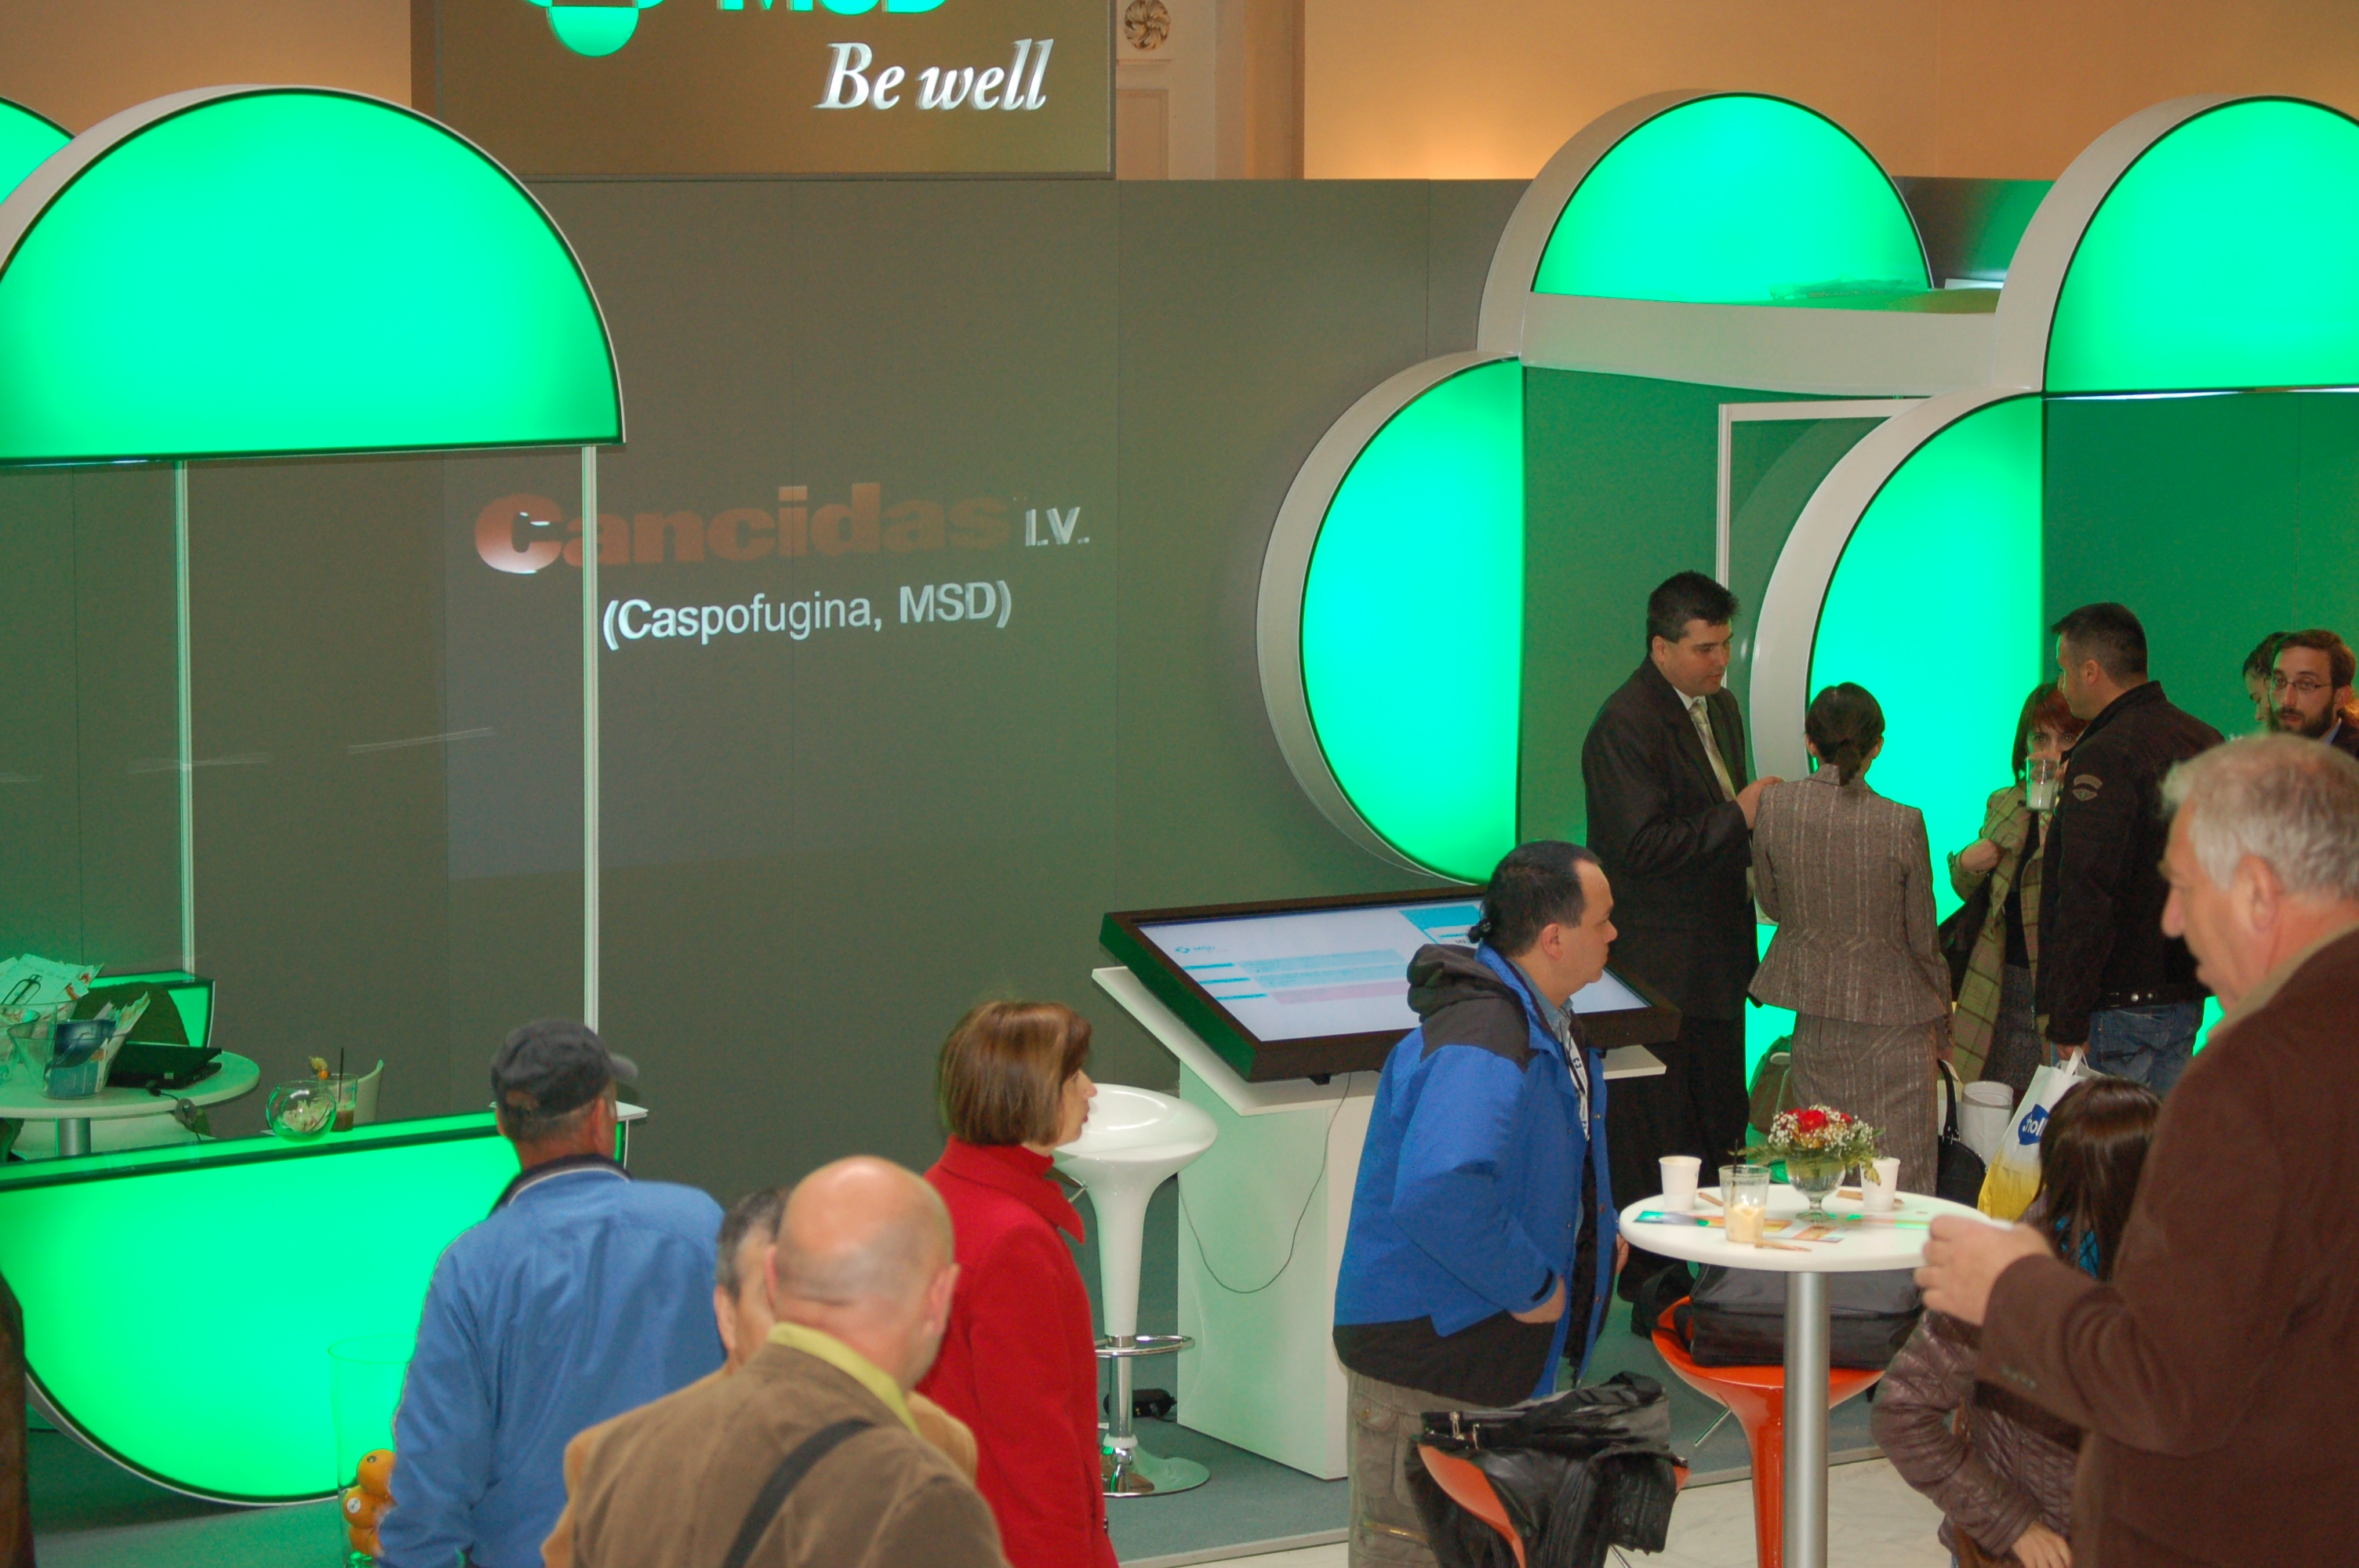 Exhibition Stand Interactive : Evolvemedia msd interactive exhibition stand